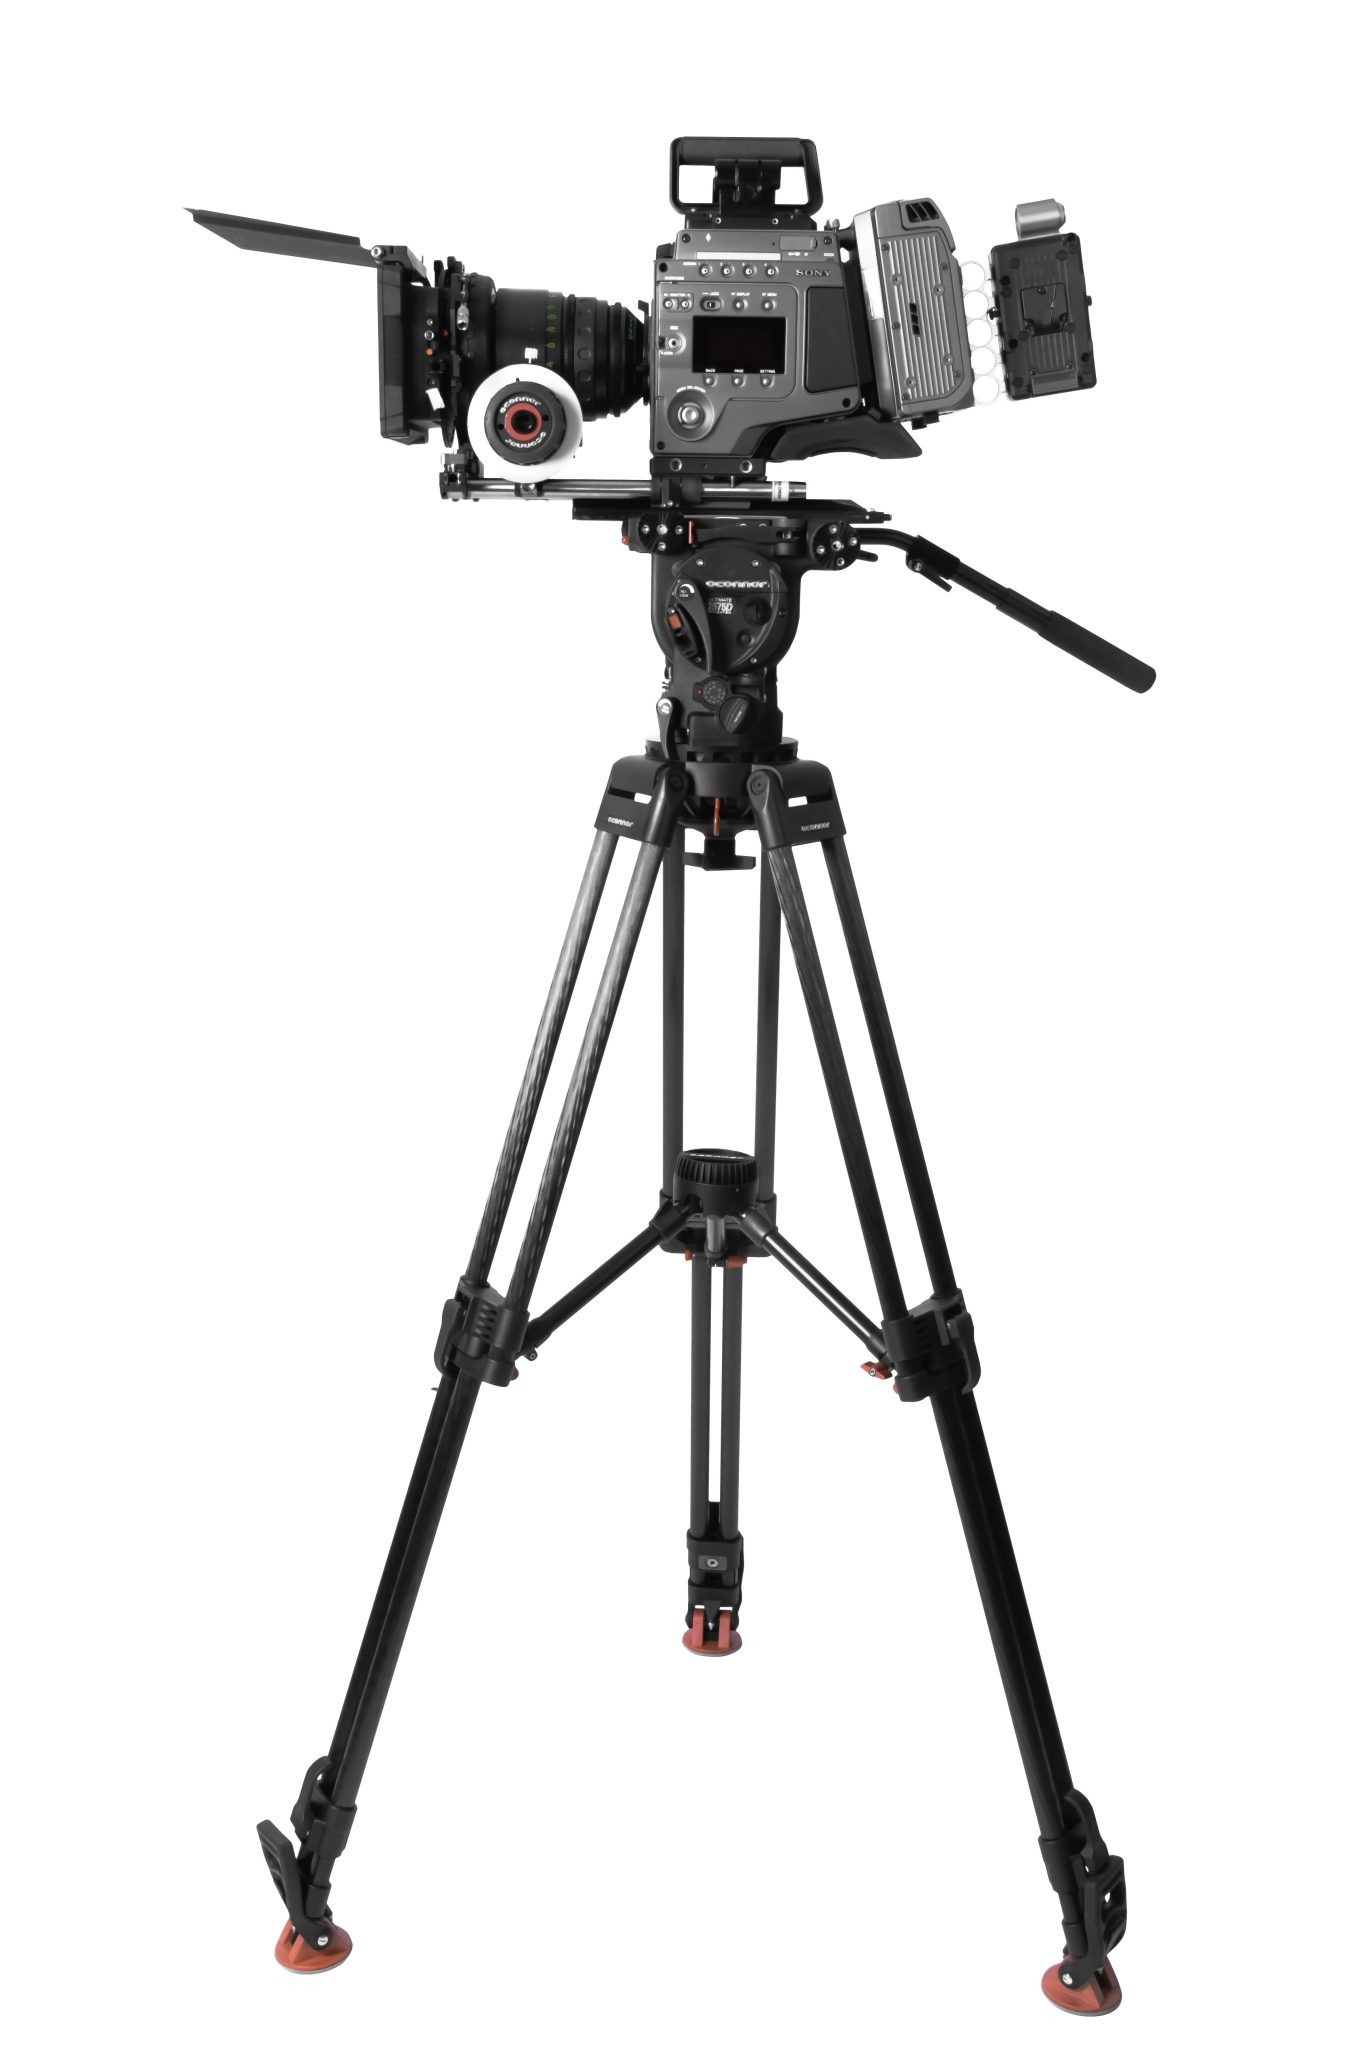 TYTO CARBON Cinematic Camera Stabilizer: